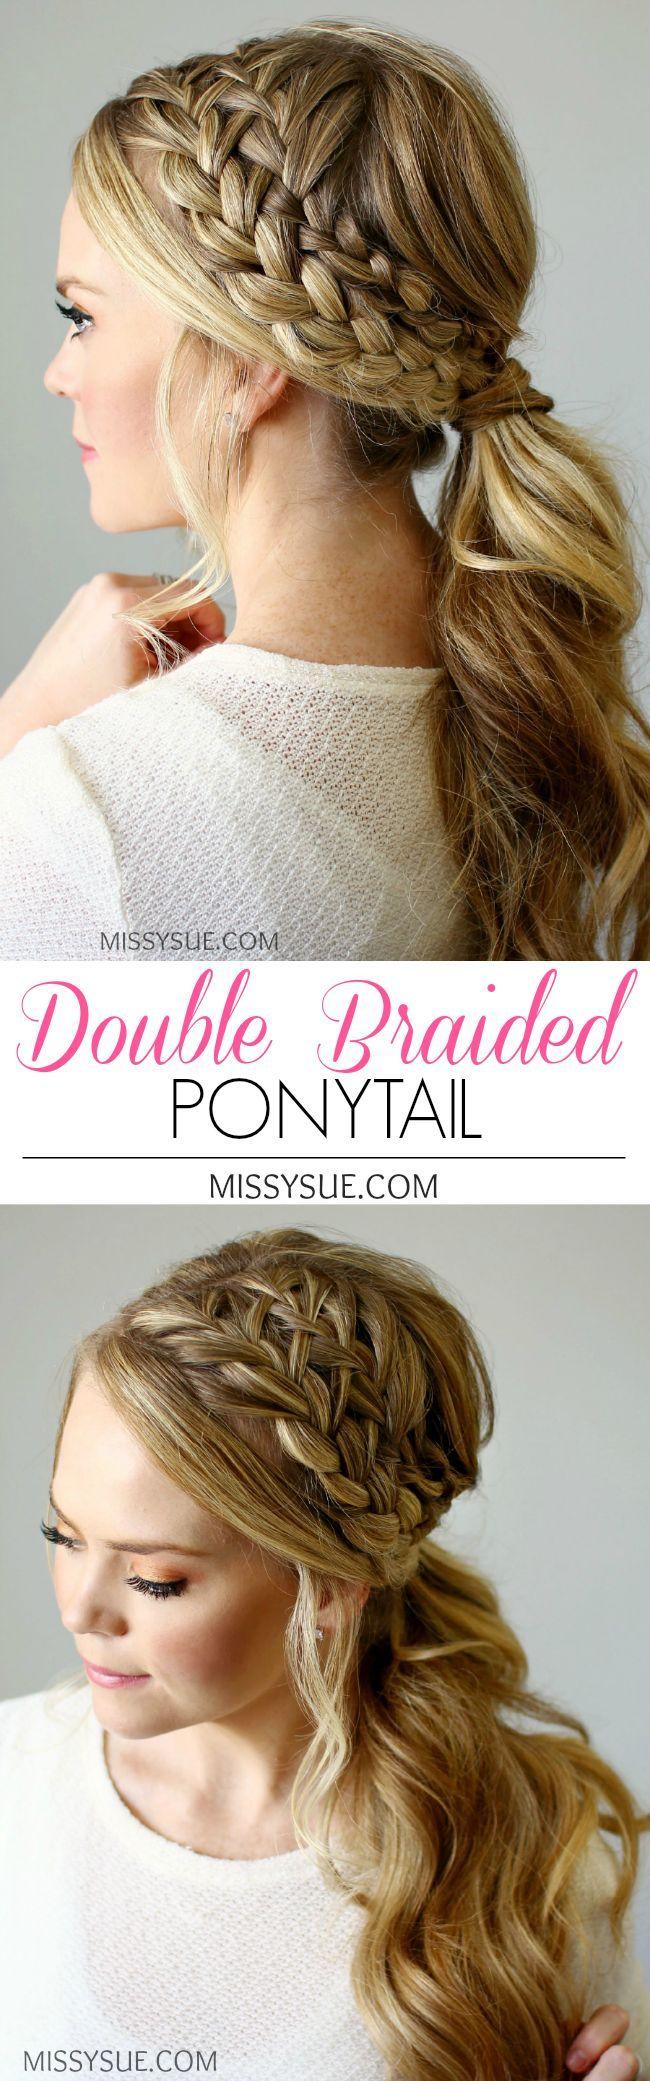 Strange 1000 Ideas About Braided Ponytail Hairstyles On Pinterest Short Hairstyles For Black Women Fulllsitofus